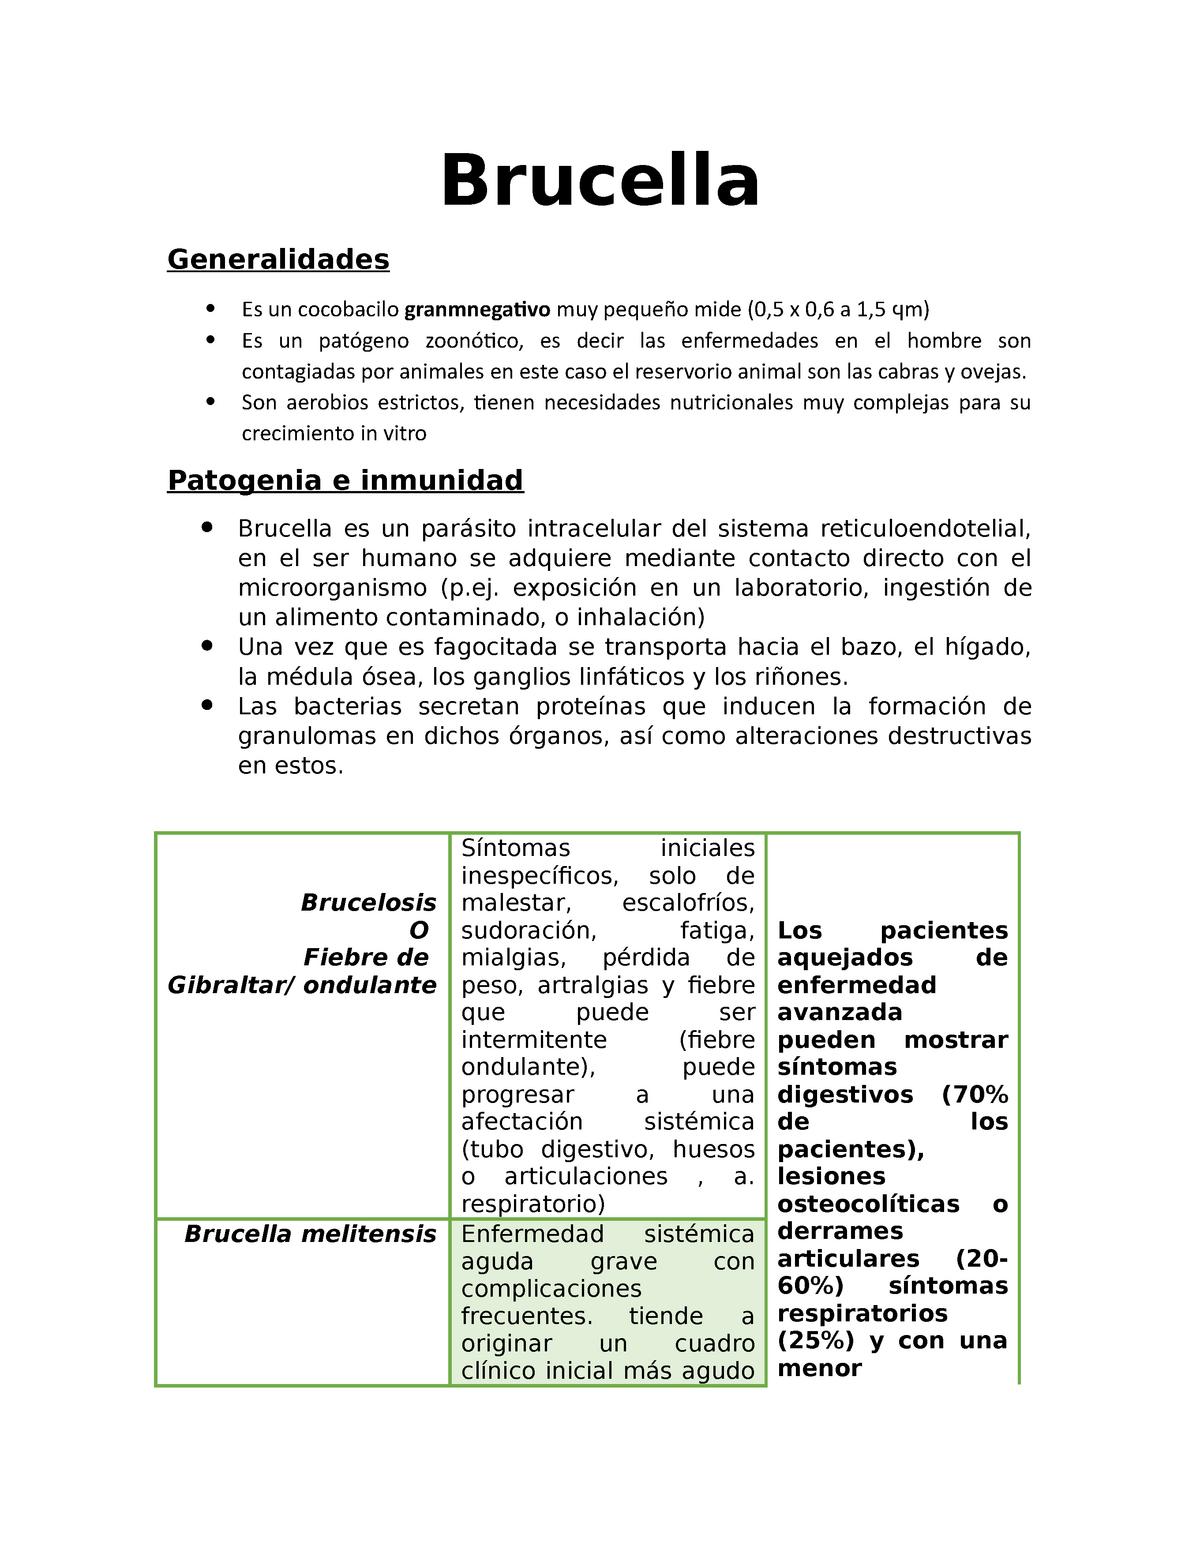 Brucella Microbiologia Y Parasitologia Uan Studocu